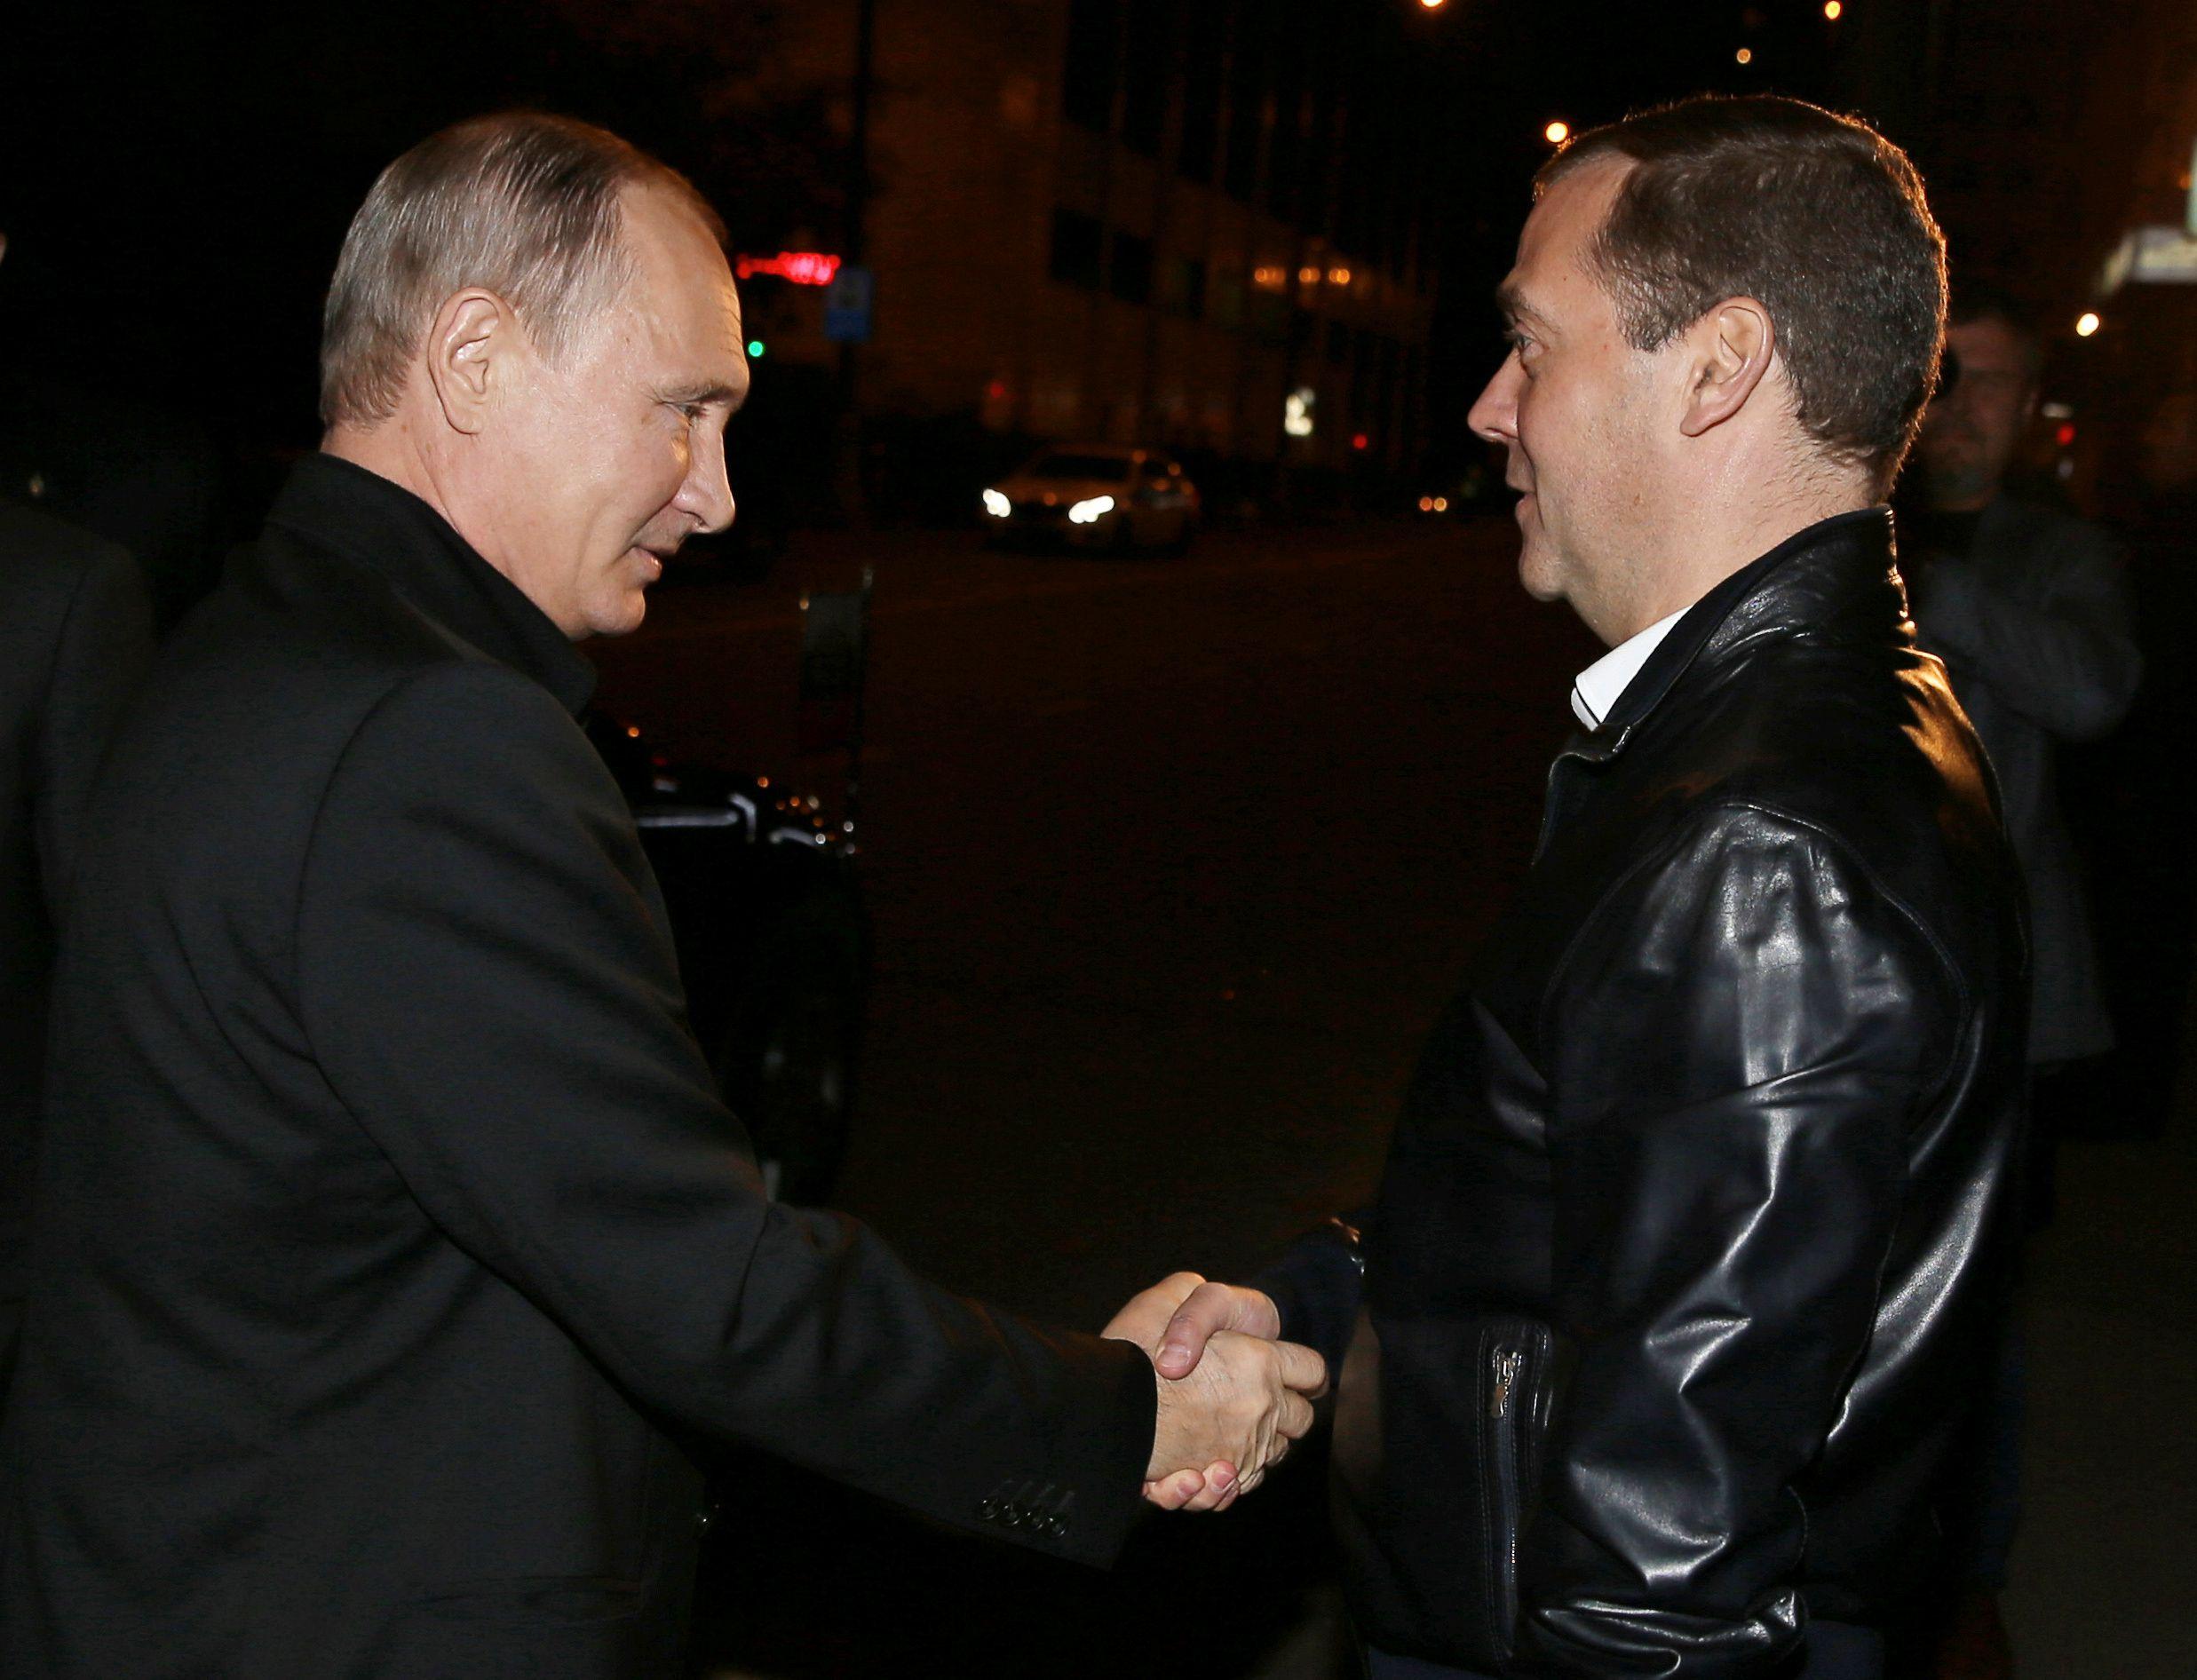 Vladimir Putin greets Dmitry Medvedev